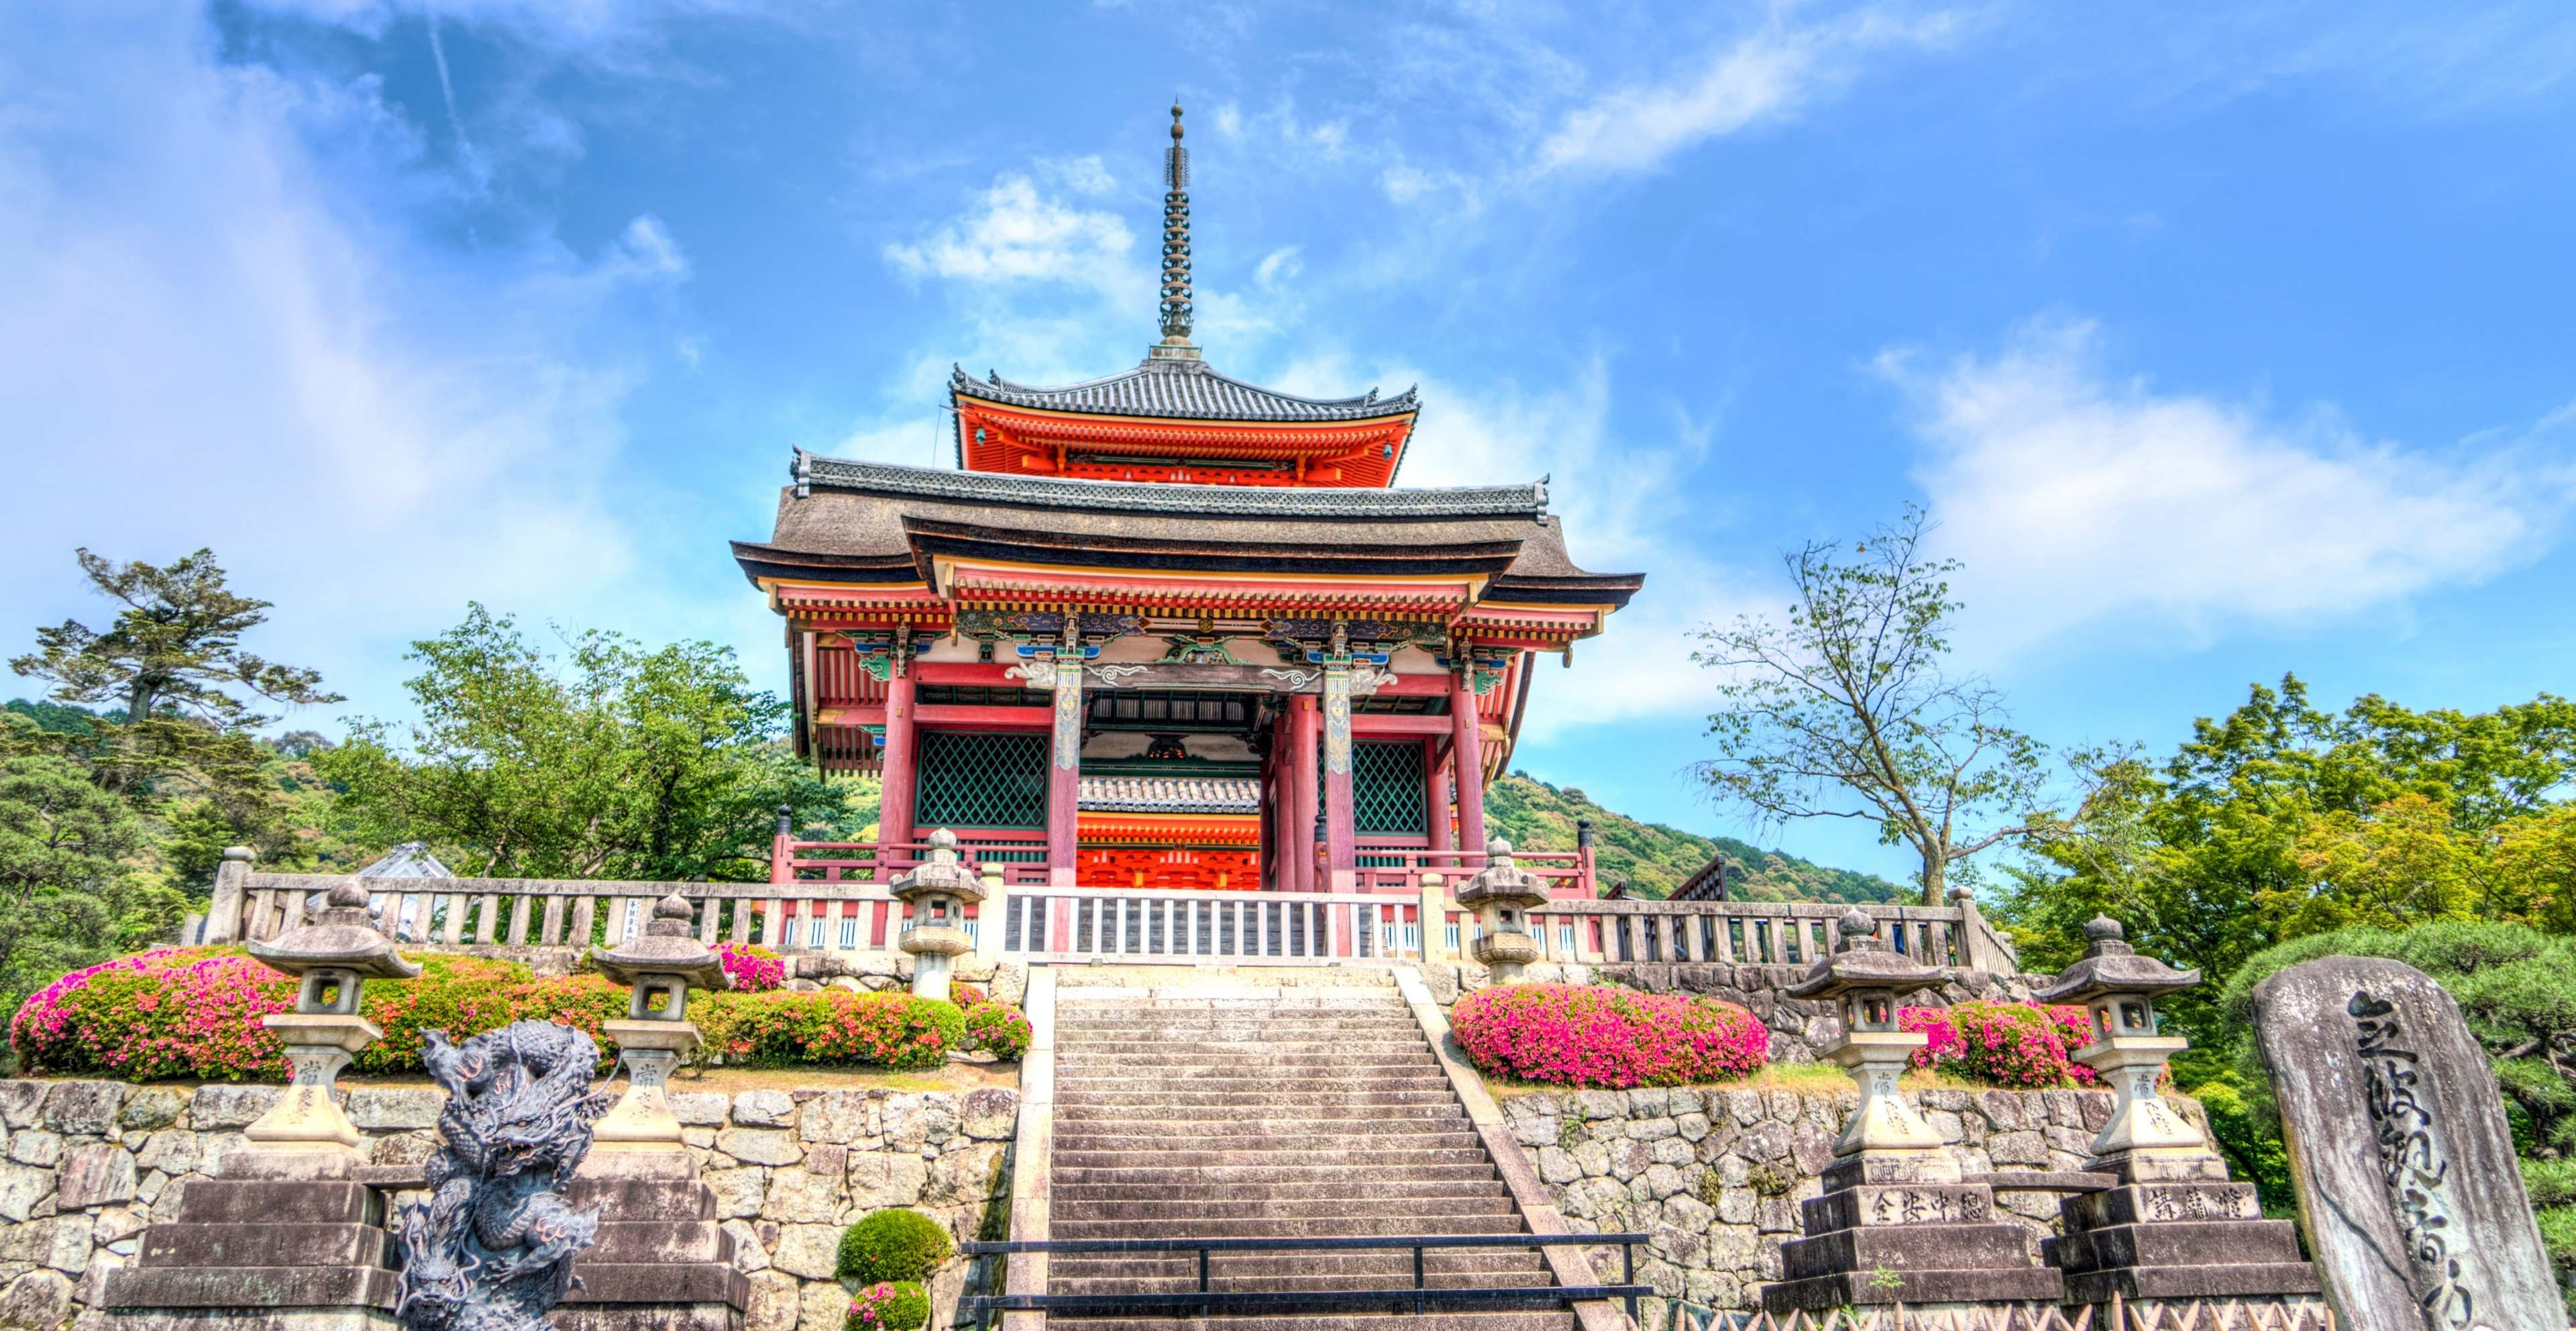 Res: 3840x1984, ... historic, japan, japanese, kyoto, landmark, landscape, marquee,  outdoors, park, religion, scene, scenery, scenic, sens ji, 4k wallpaper and  background